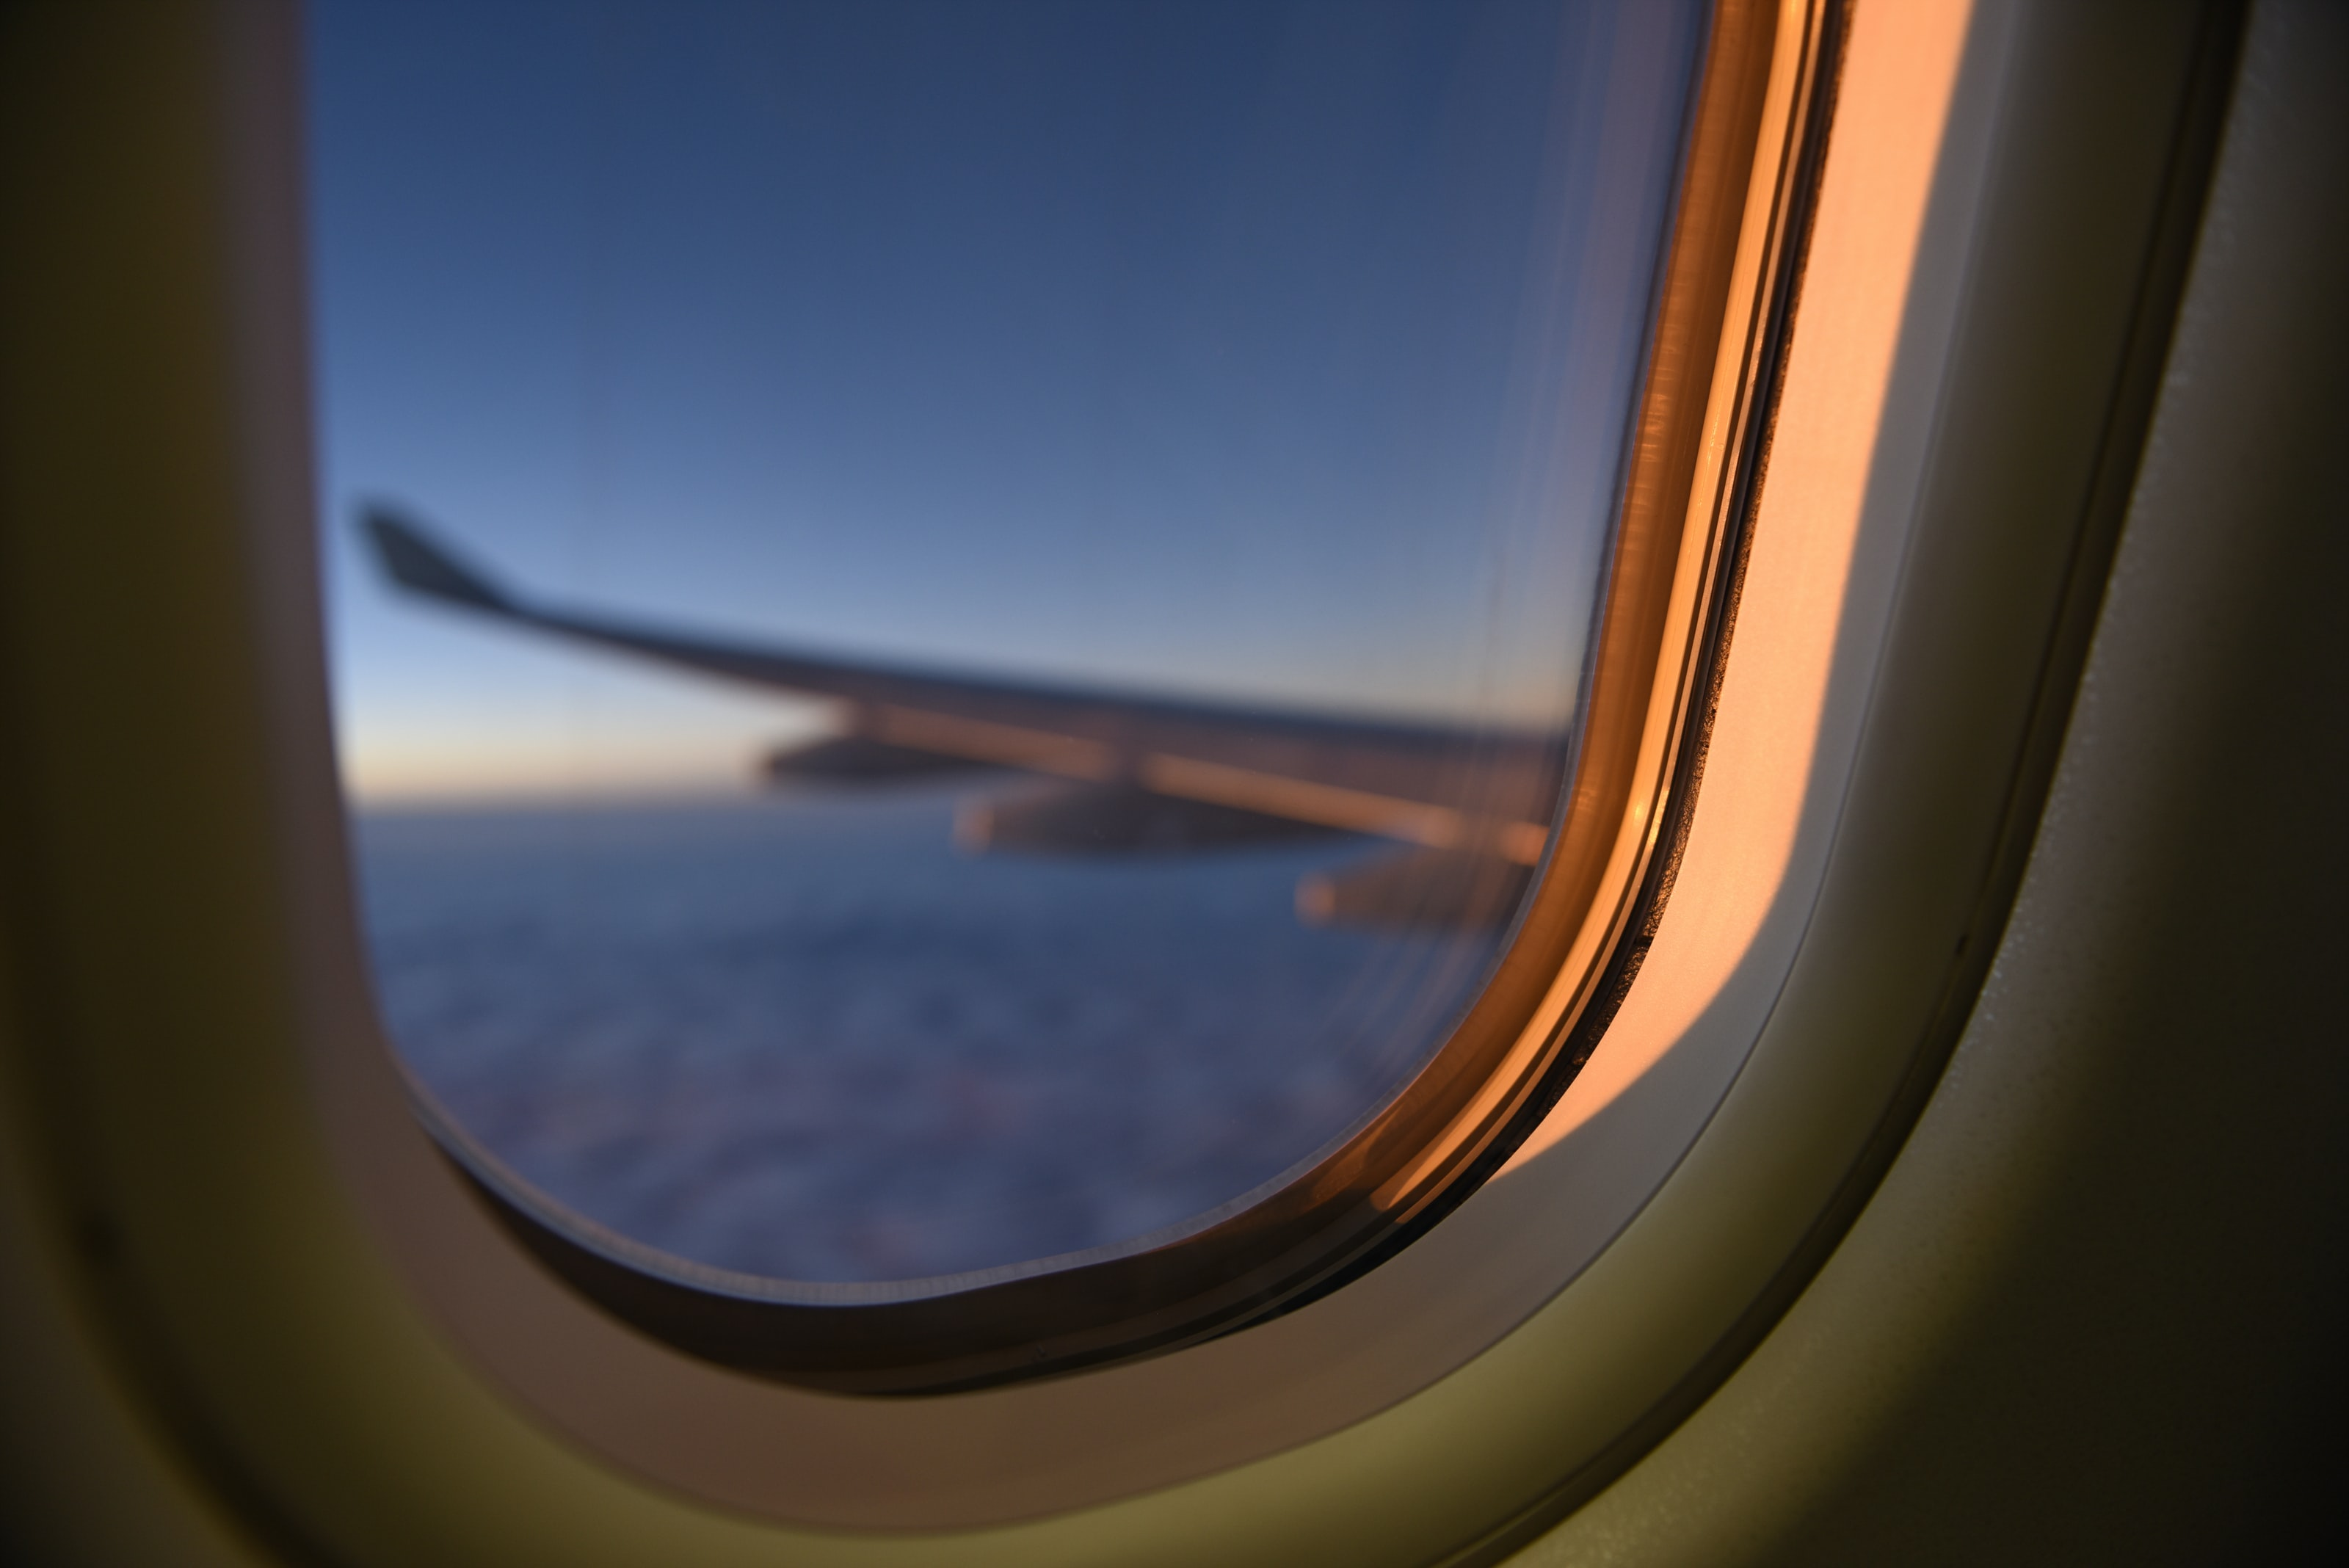 high angel photography of plane